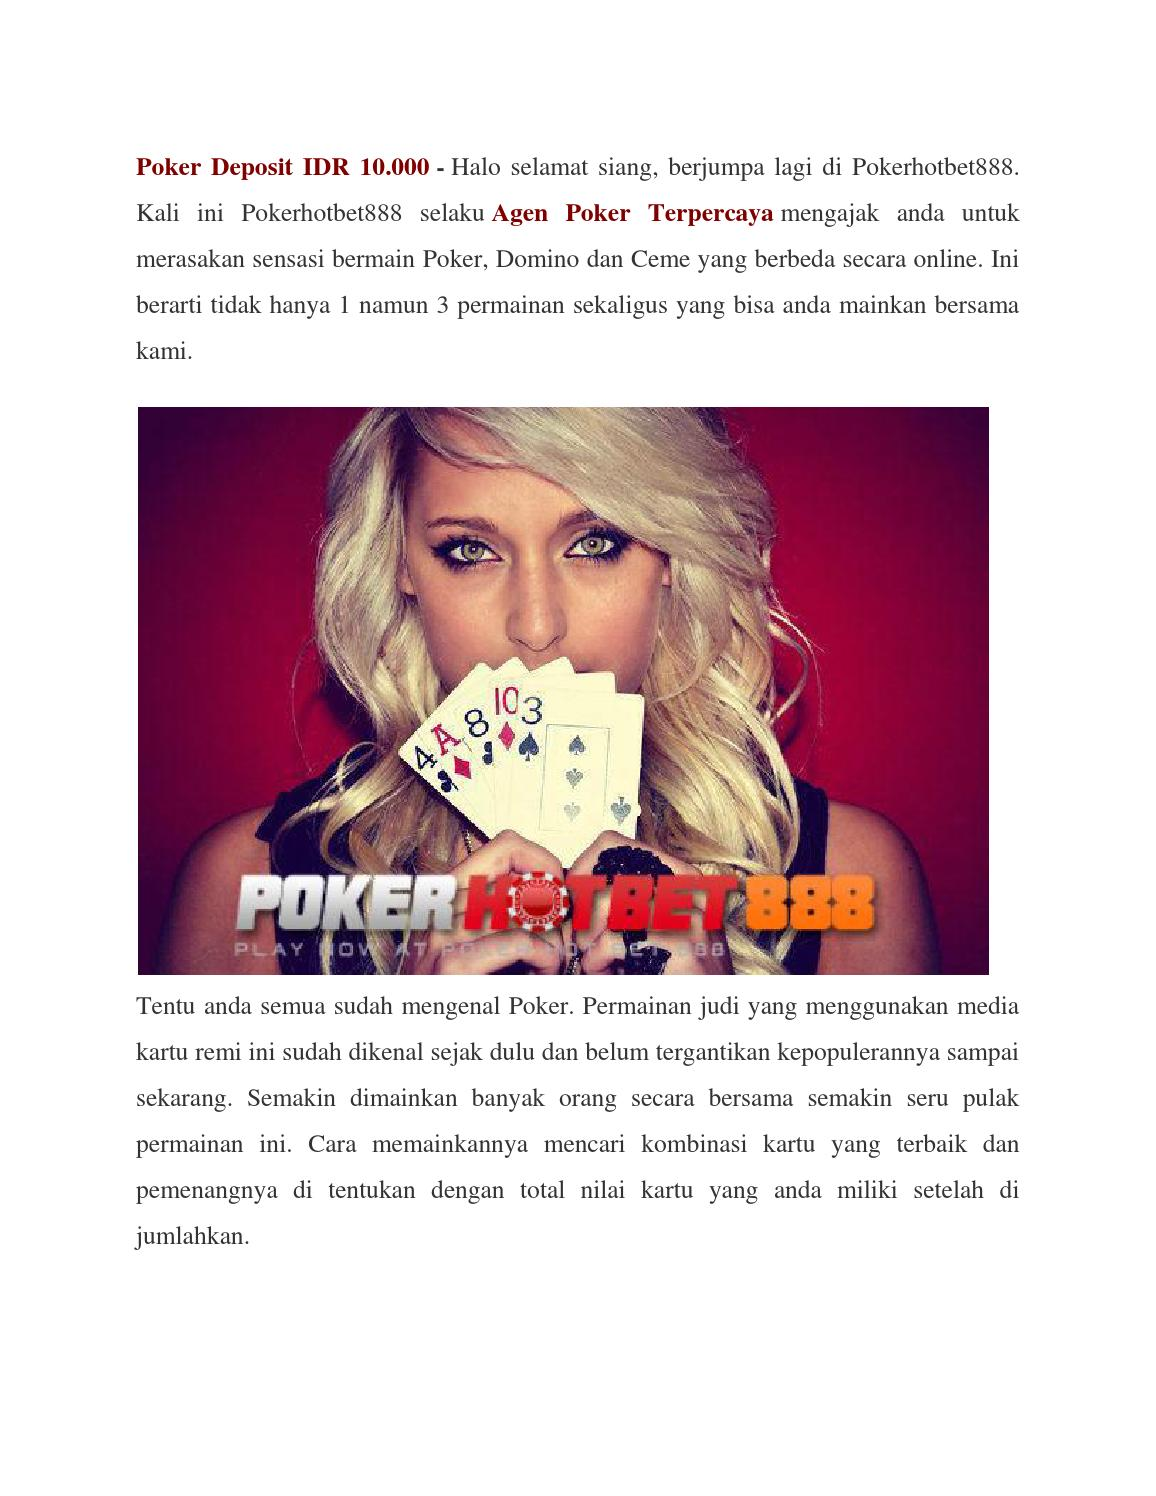 Poker Idr